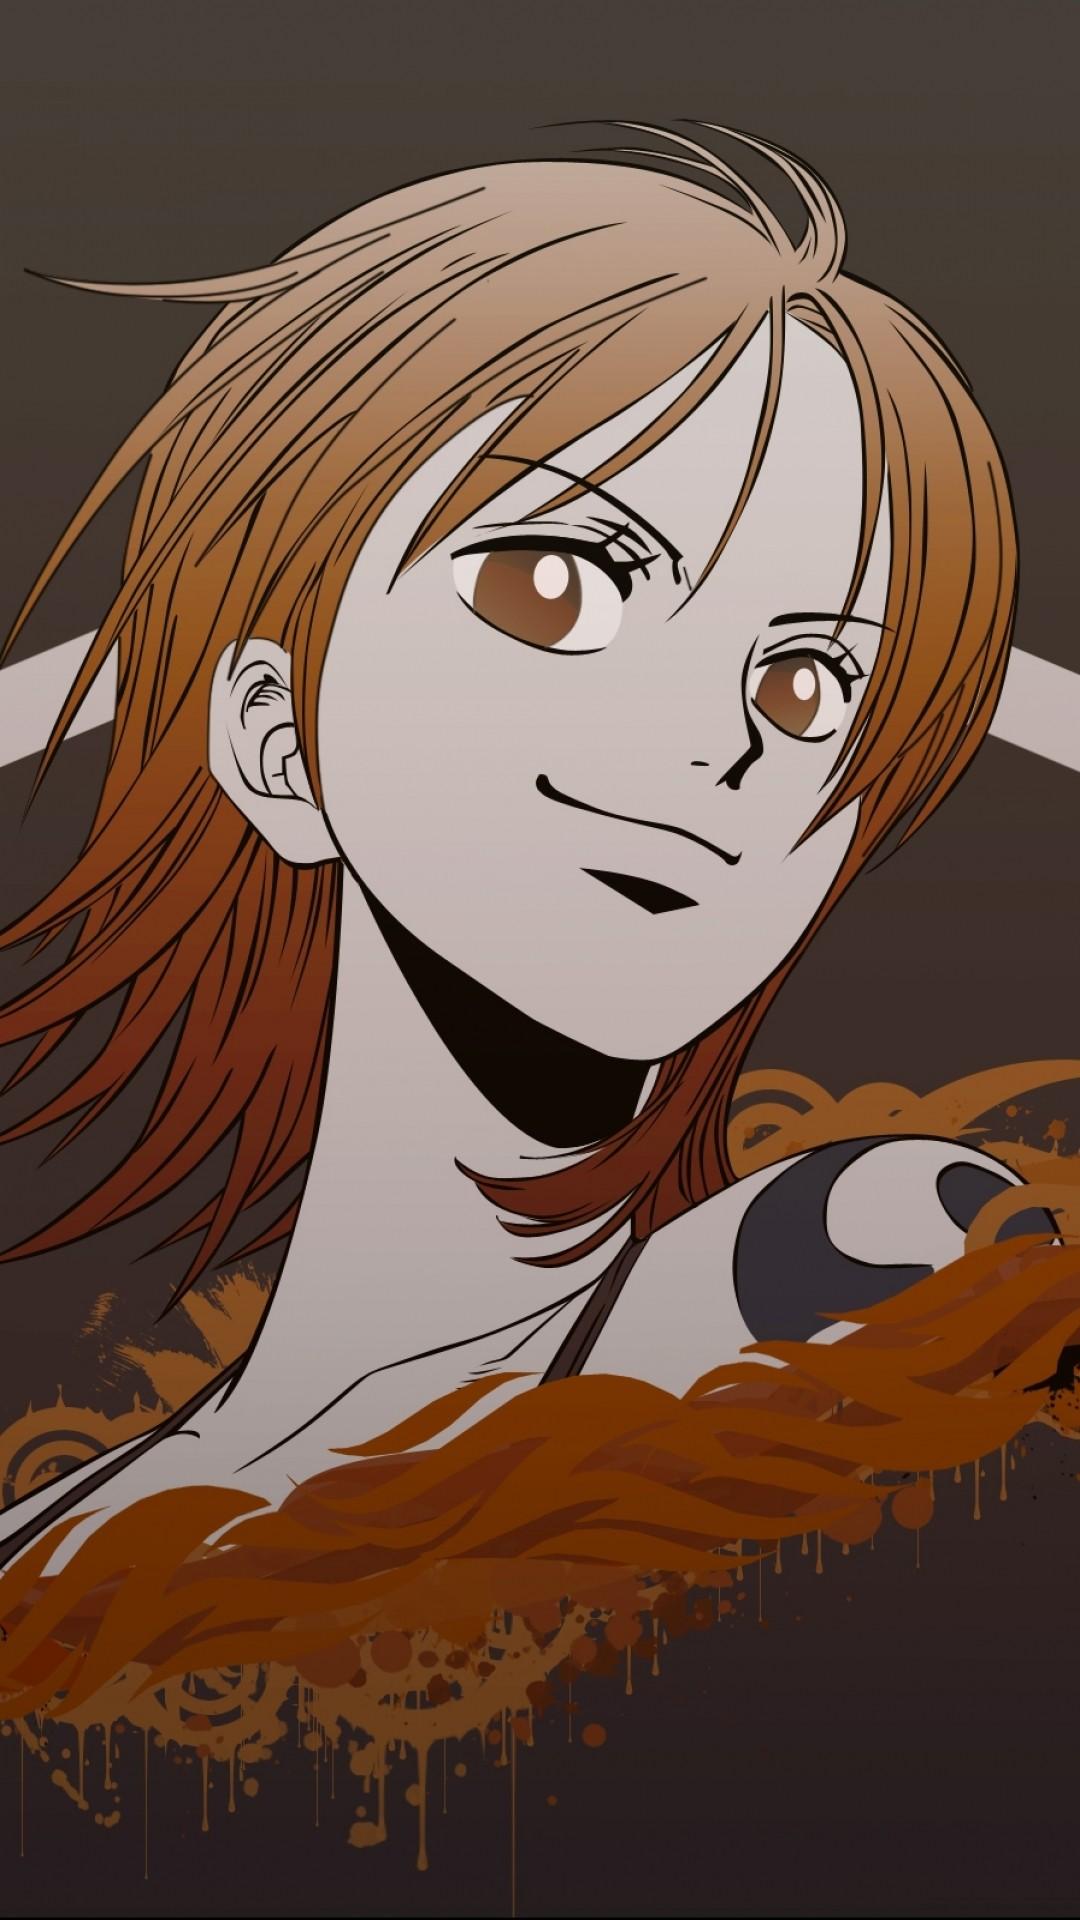 Anime One Piece Nami One Piece Nami Wallpaper Iphone 1080x1920 Wallpaper Teahub Io